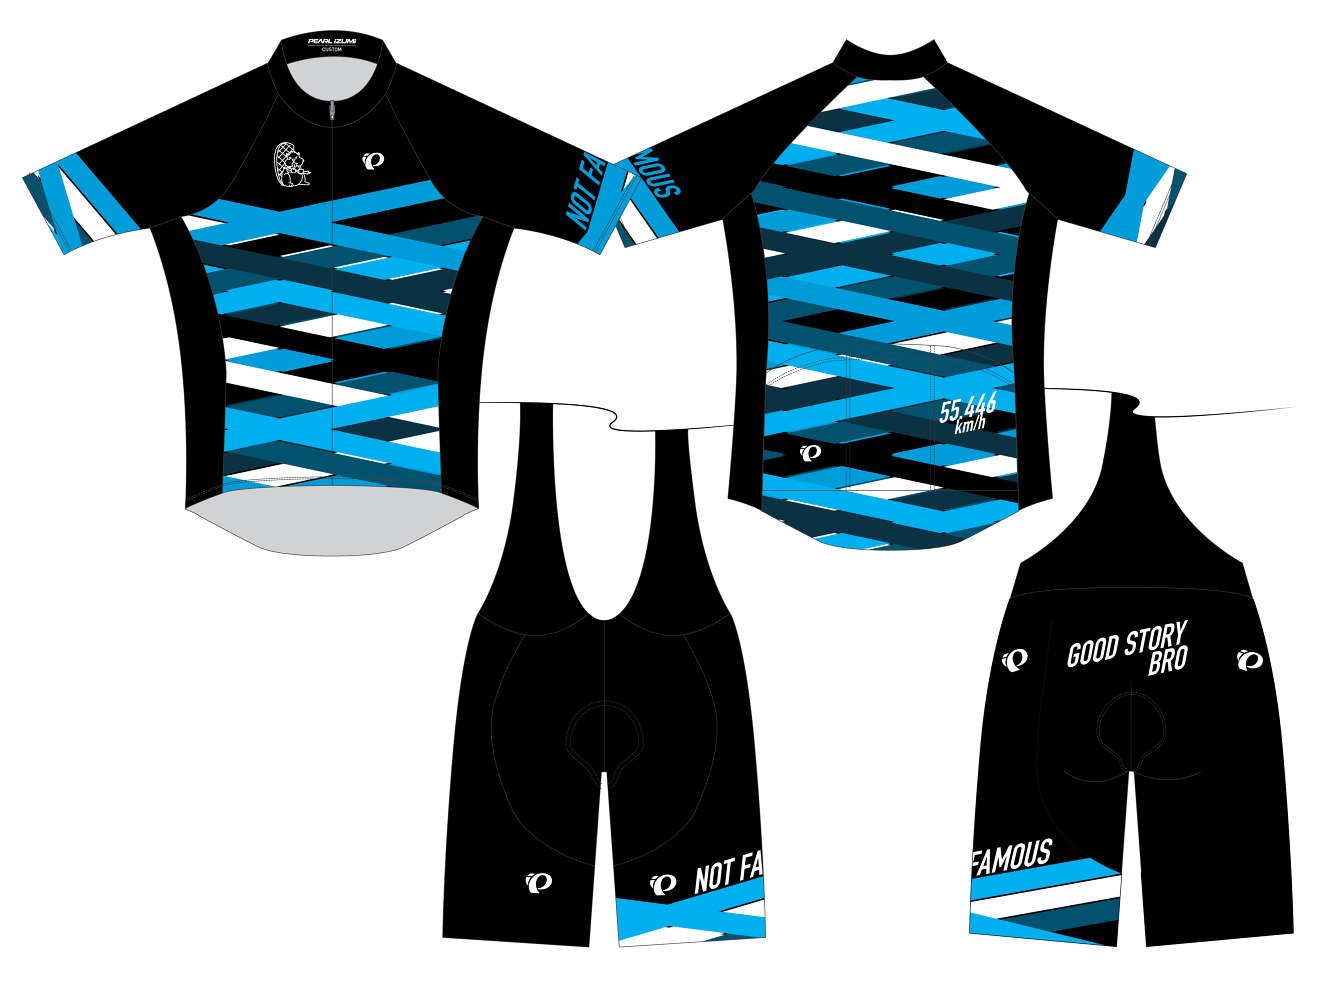 Pearl Izumi Custom Kits Lindsay Martin Design